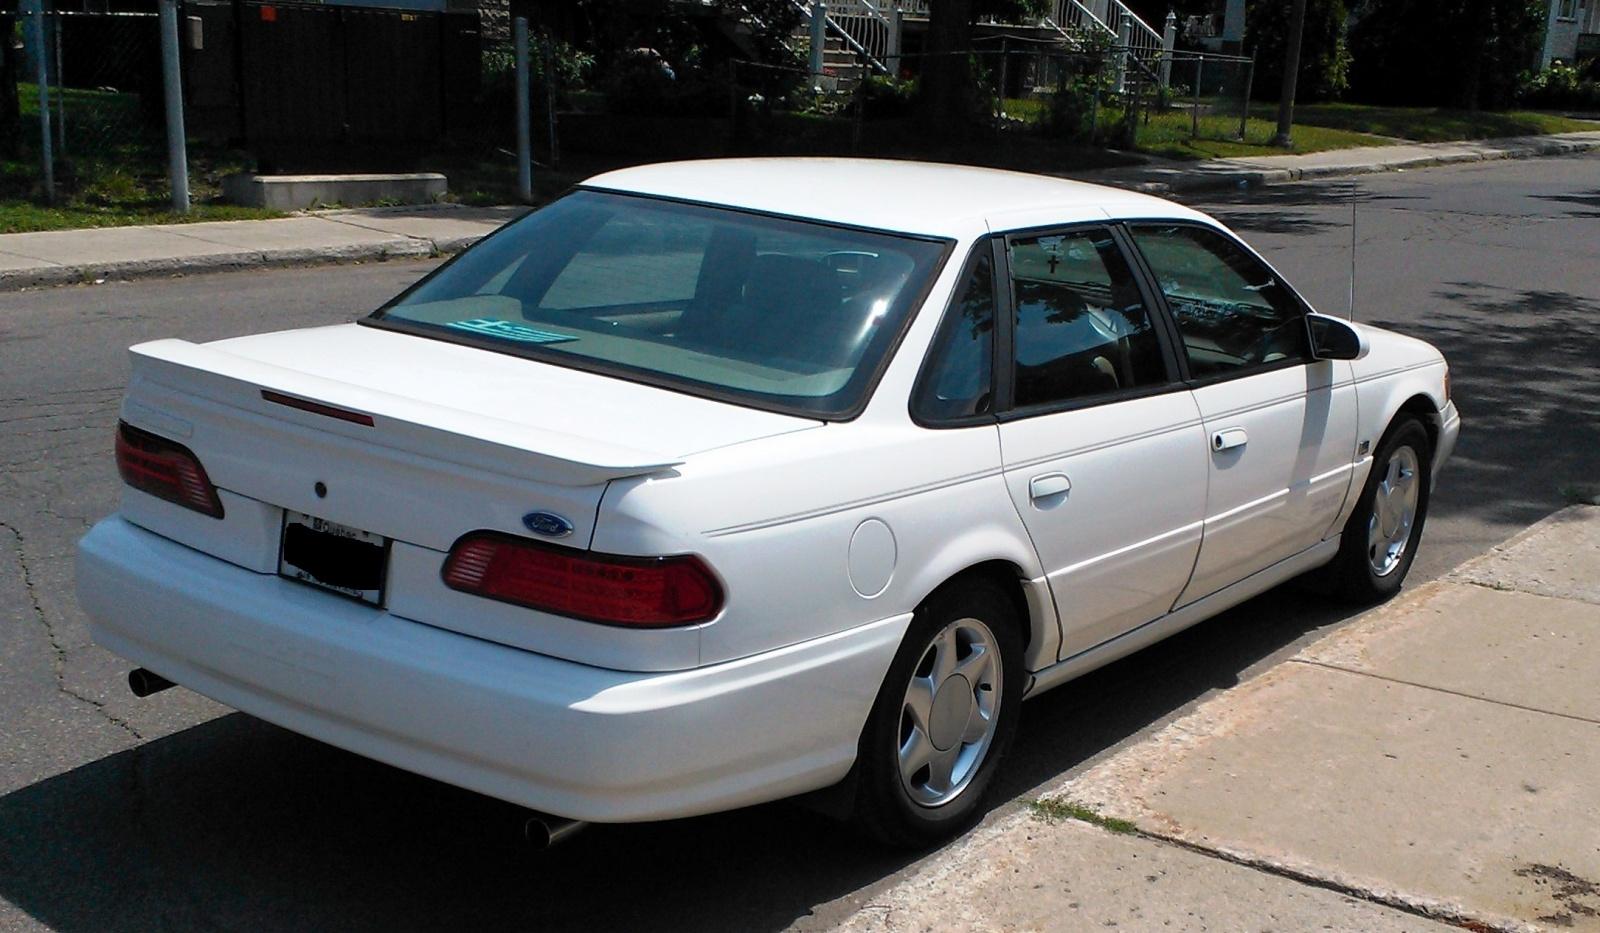 2016 Taurus Sho >> 60 in 6.6: 1991 Ford Taurus SHO